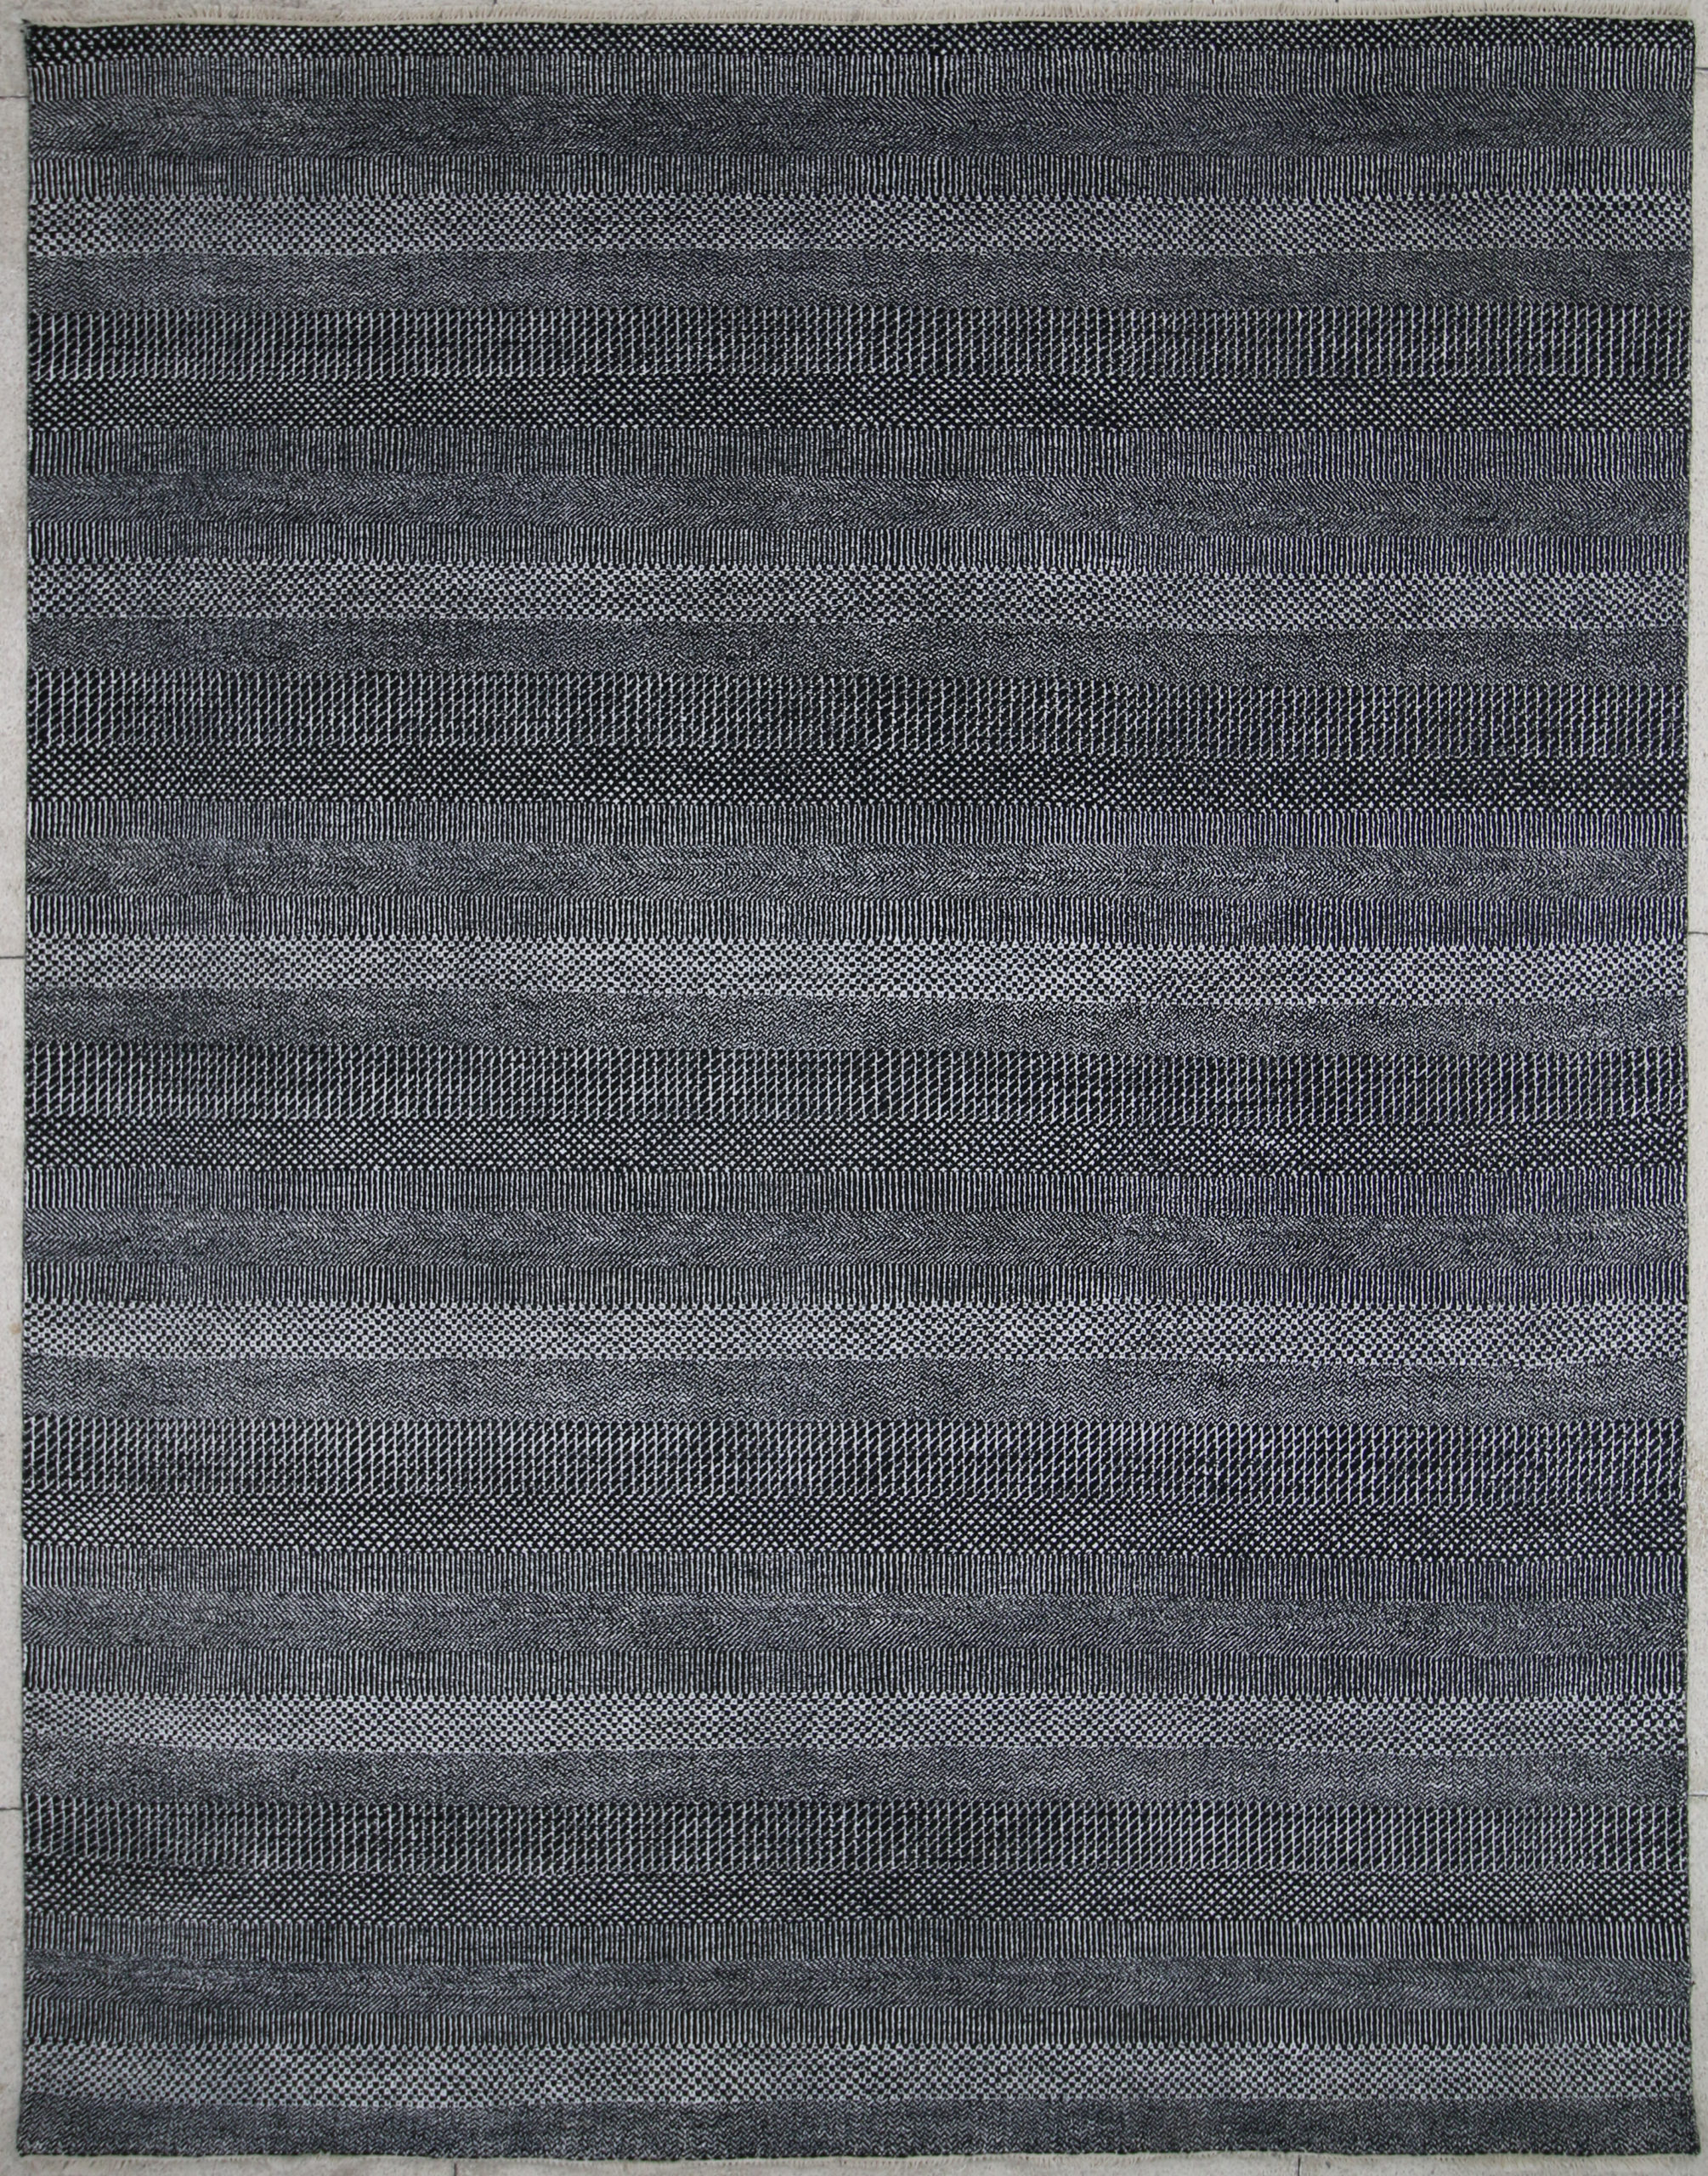 GRASS-101 Black (1)